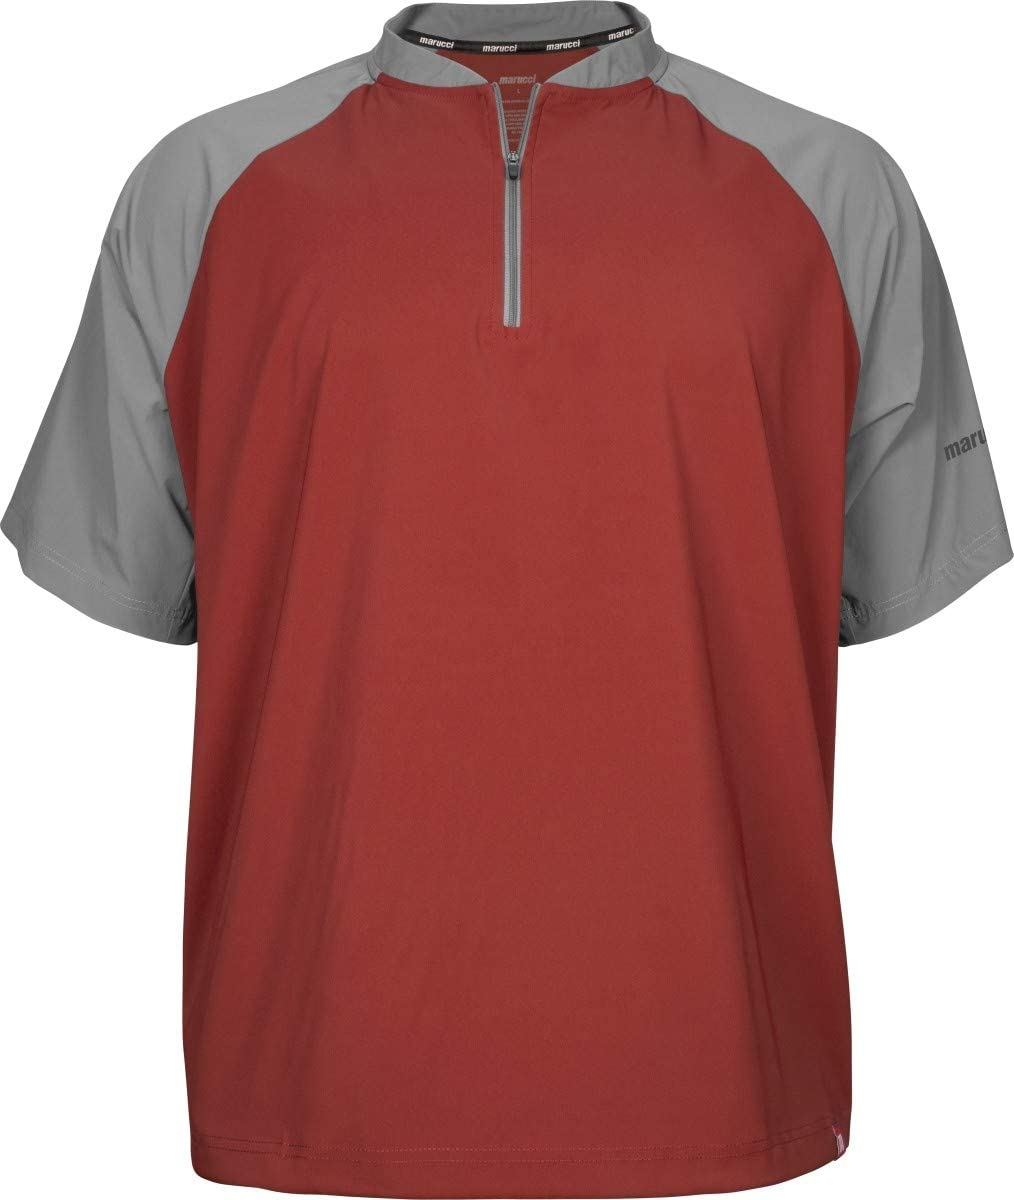 marucci-team-cage-jacket-red-matcgj-r-al-baseball-outerwear MATCGJ-R-L